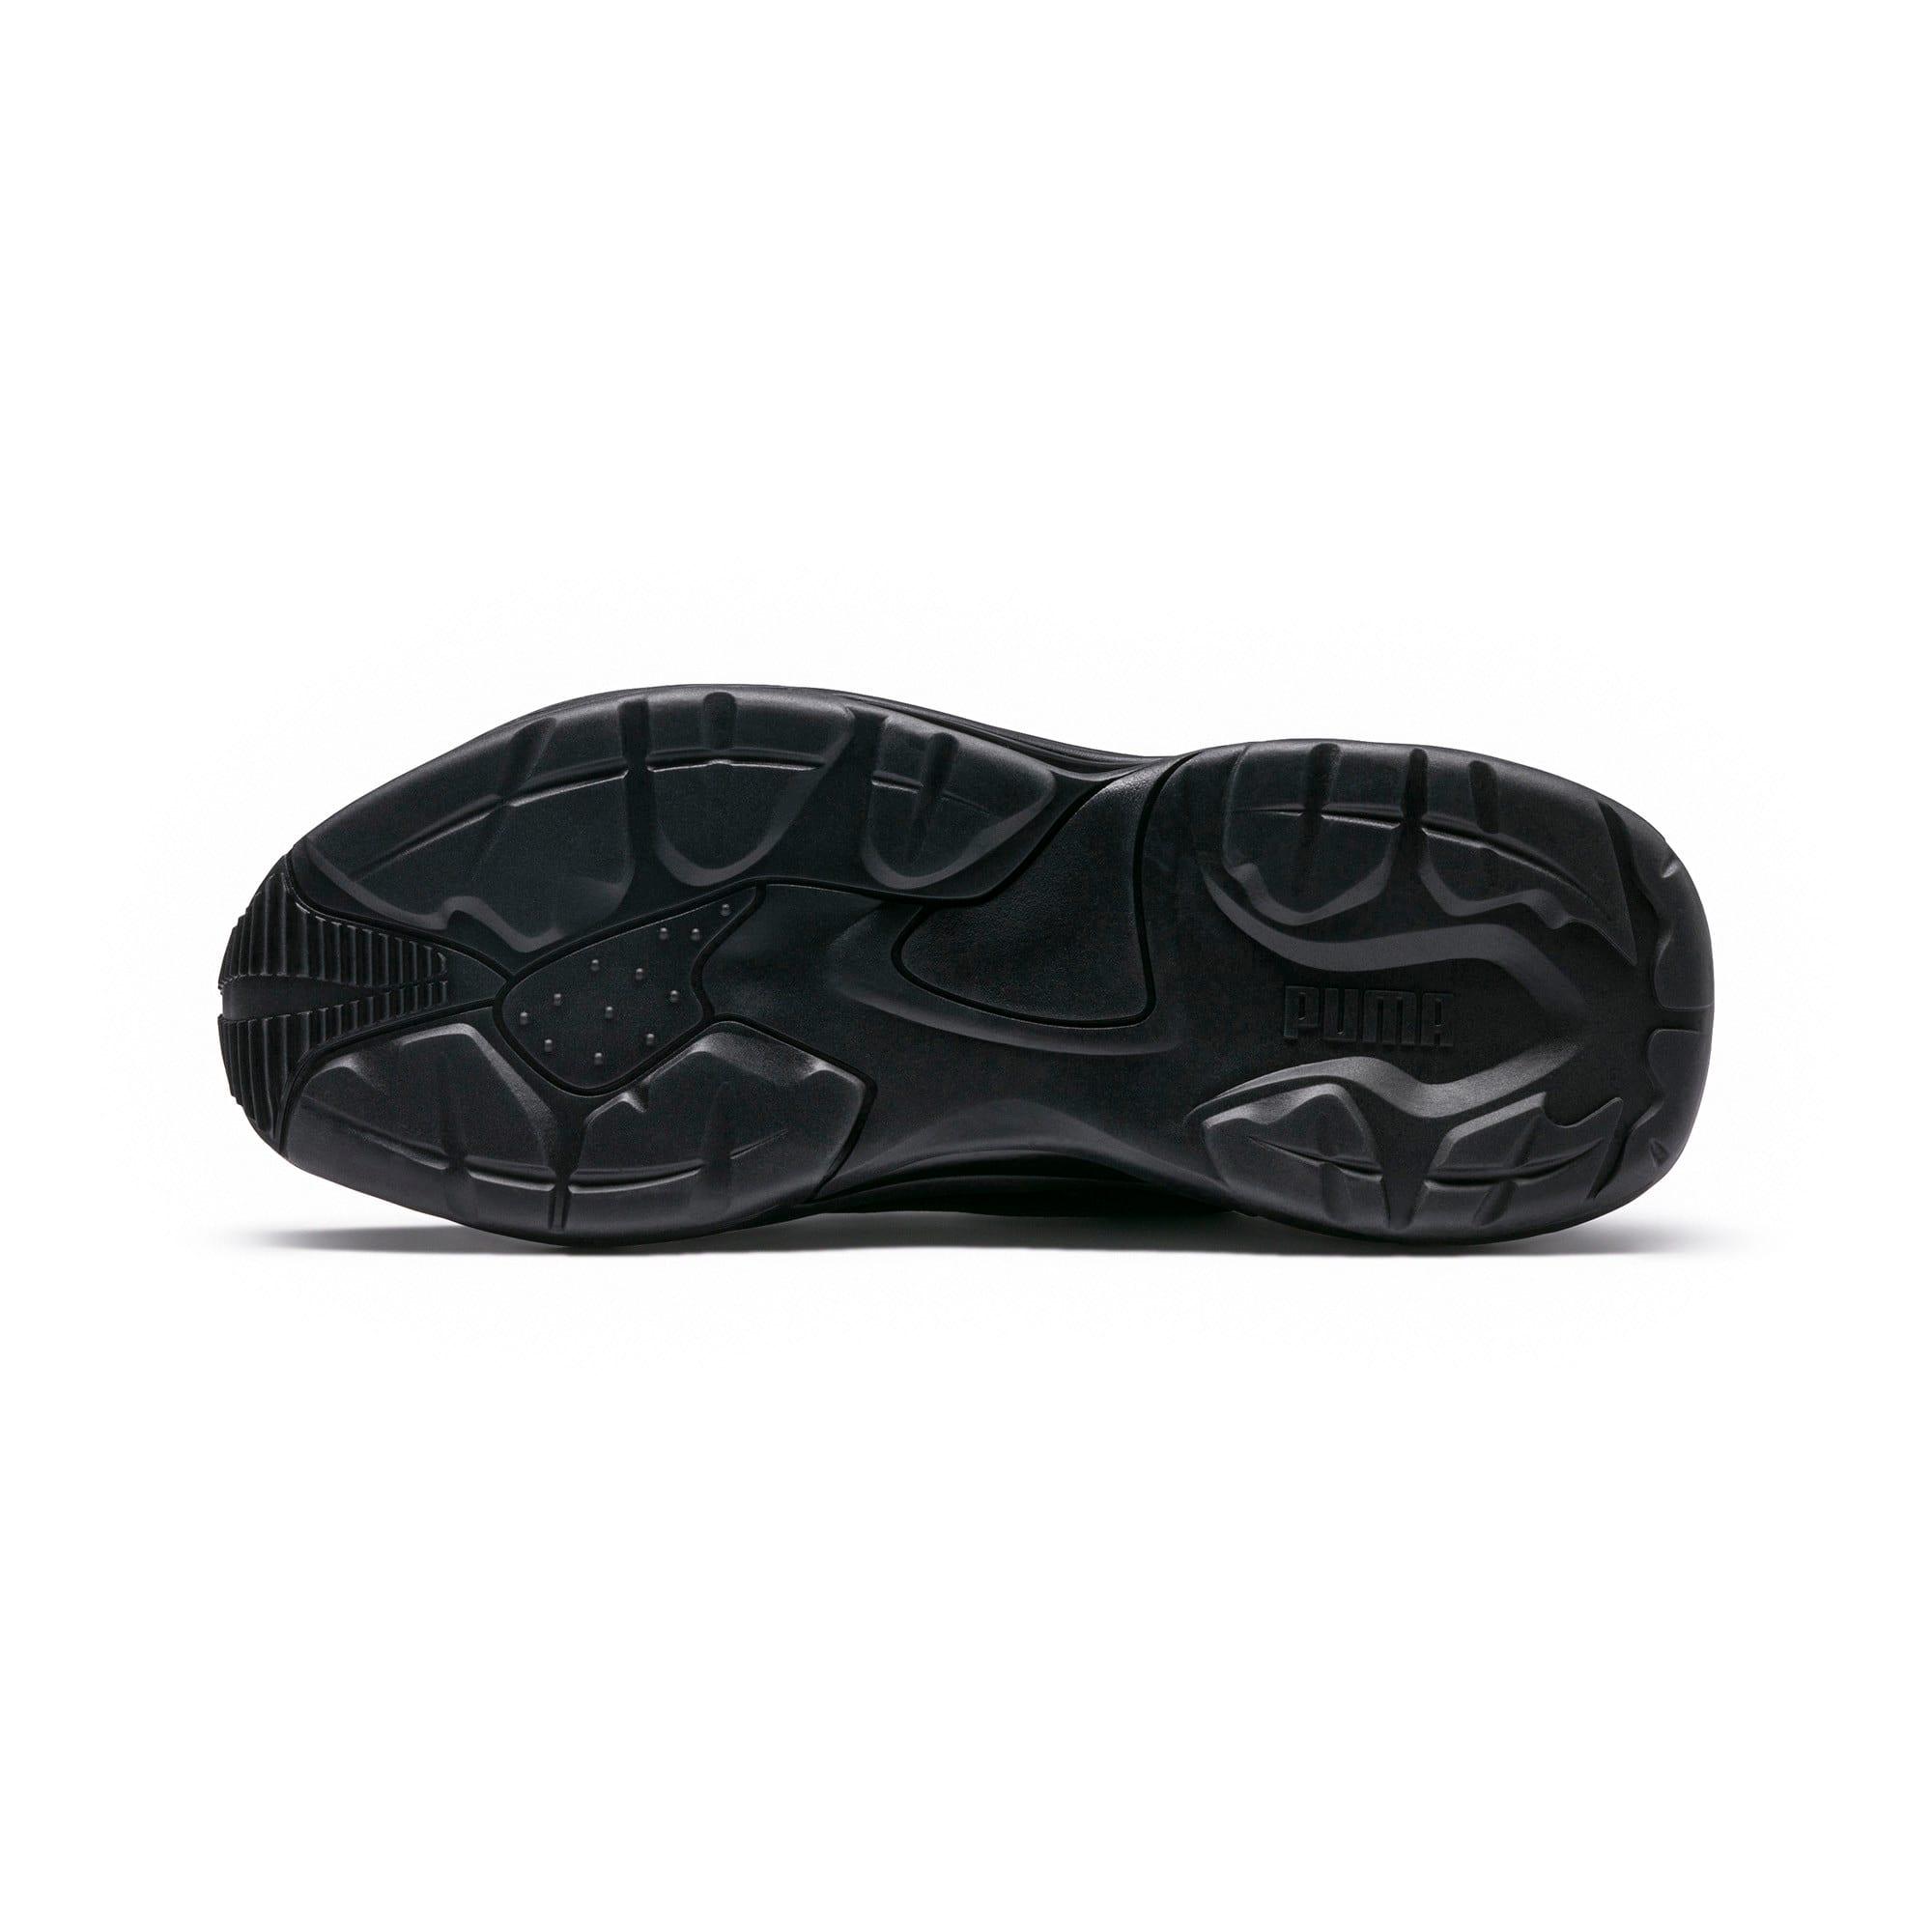 Thumbnail 3 of Thunder Desert Sneakers, Black-Puma Black-Black, medium